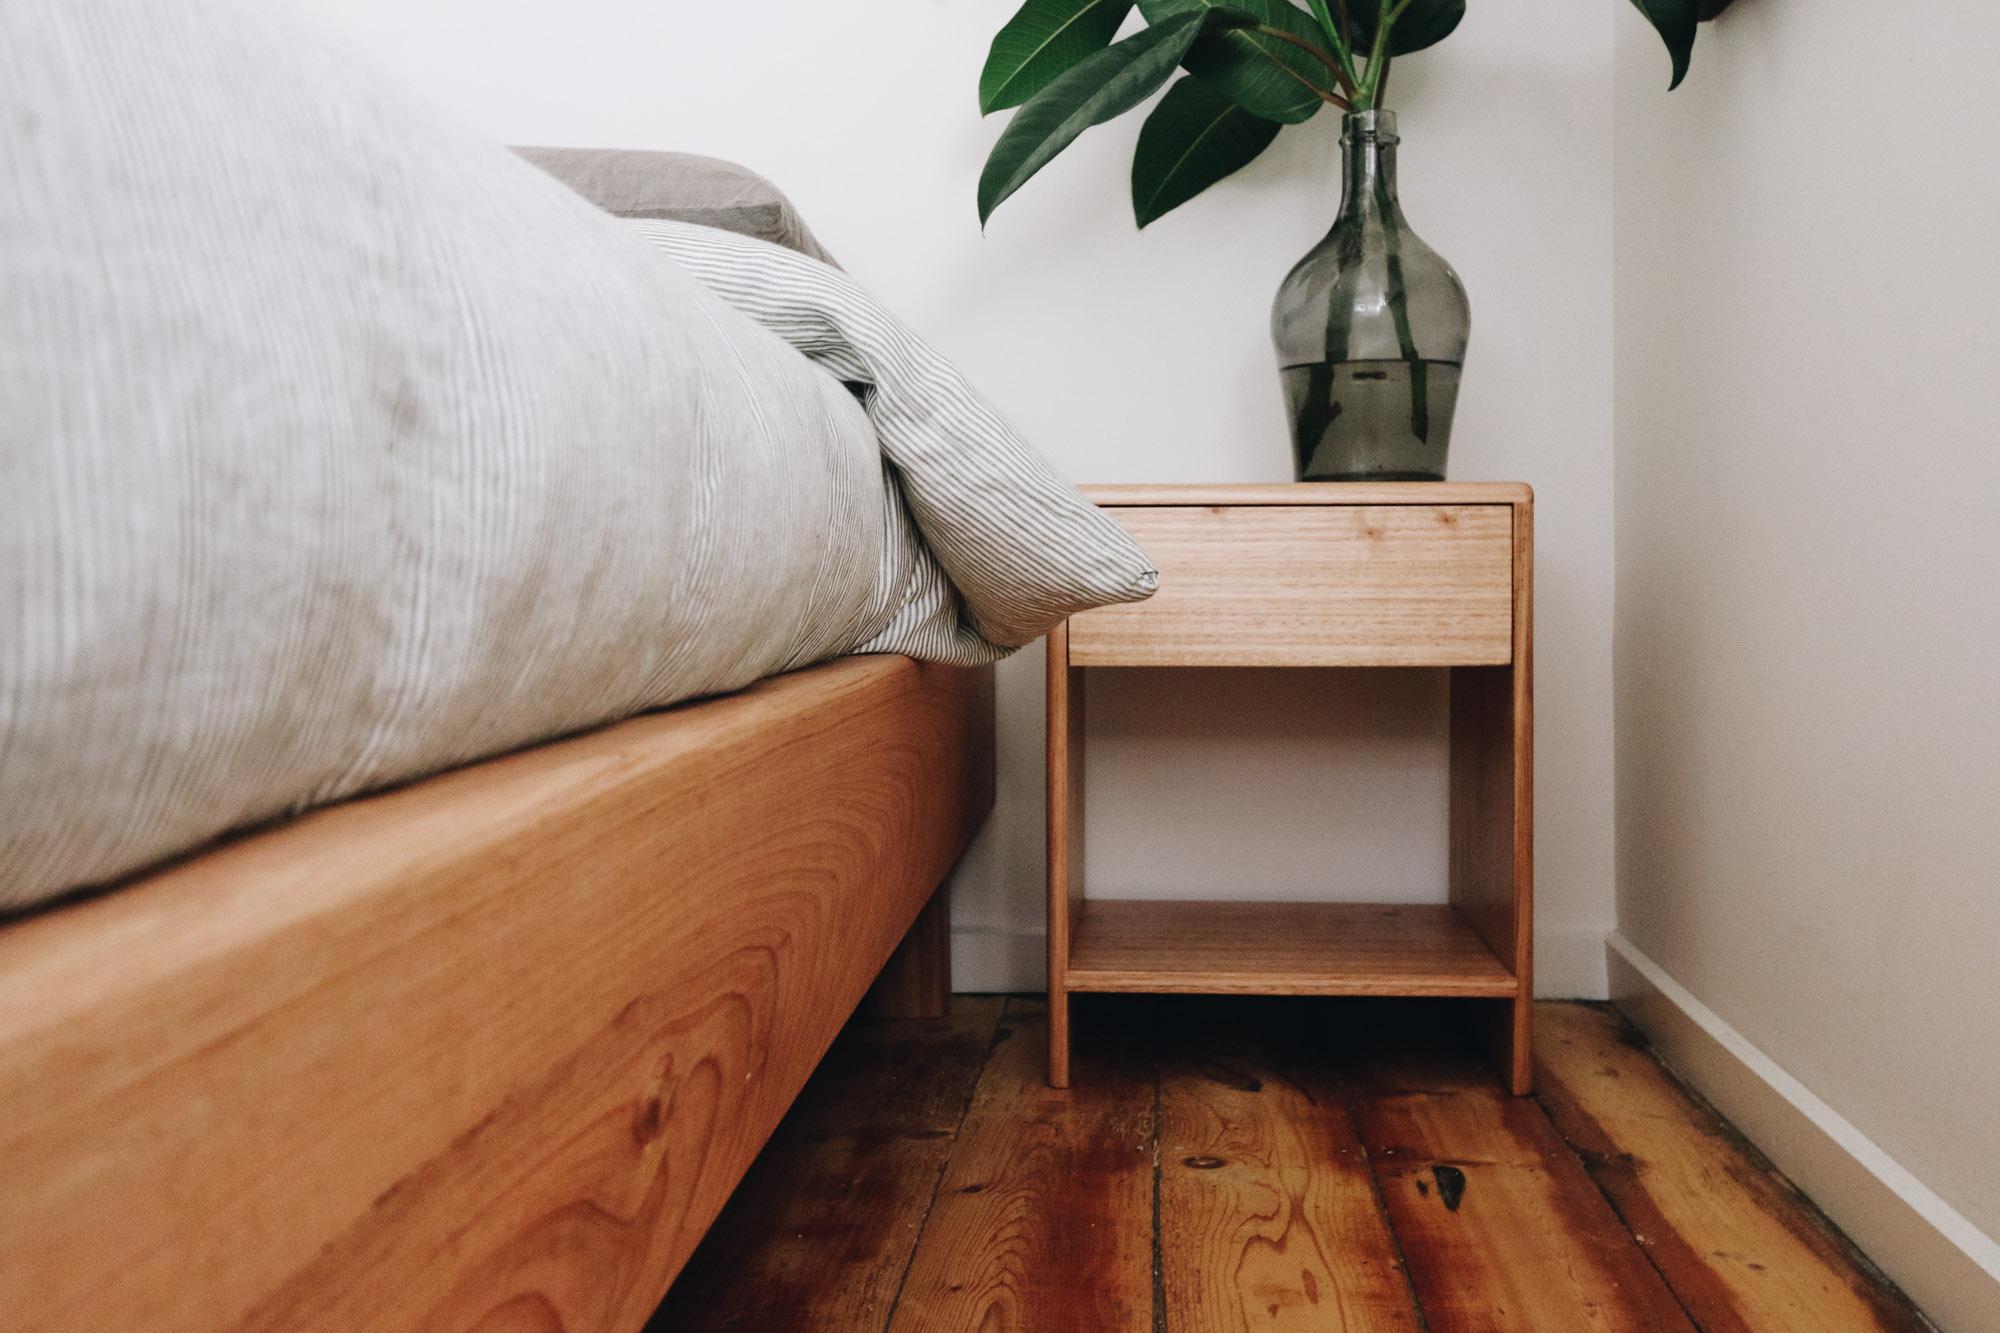 al-and-imo-handmade-simple-minimalist-low-timber-bed-frame-custom-australia-melbourne-20.jpg